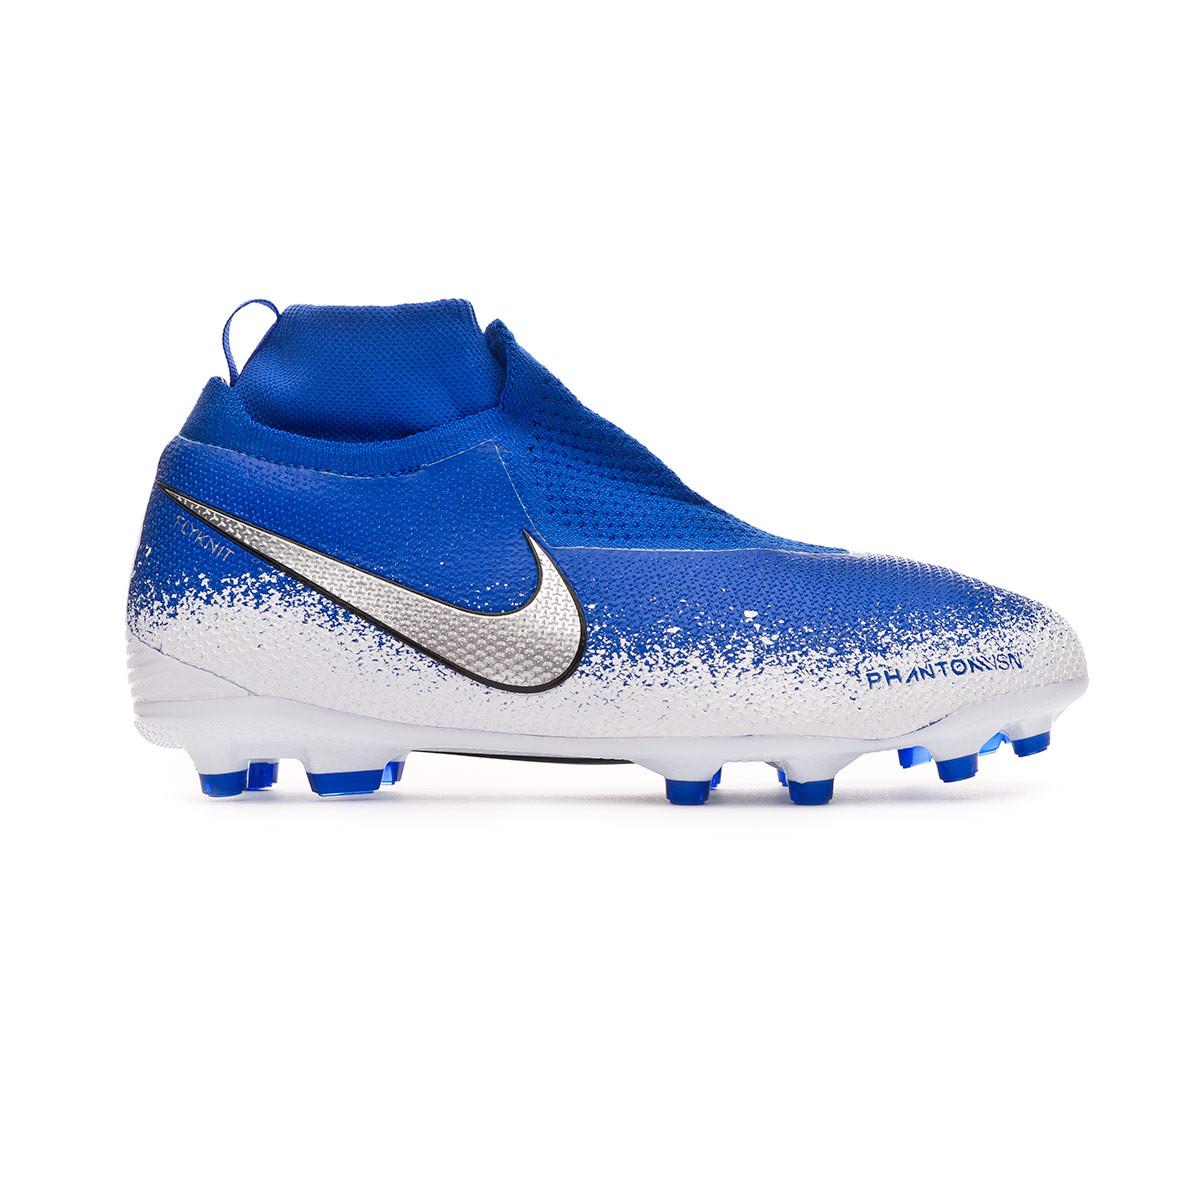 33c66fa6d Football Boots Nike Kids Phantom Vision Elite DF FG/MG Racer  blue-Chrome-White - Tienda de fútbol Fútbol Emotion